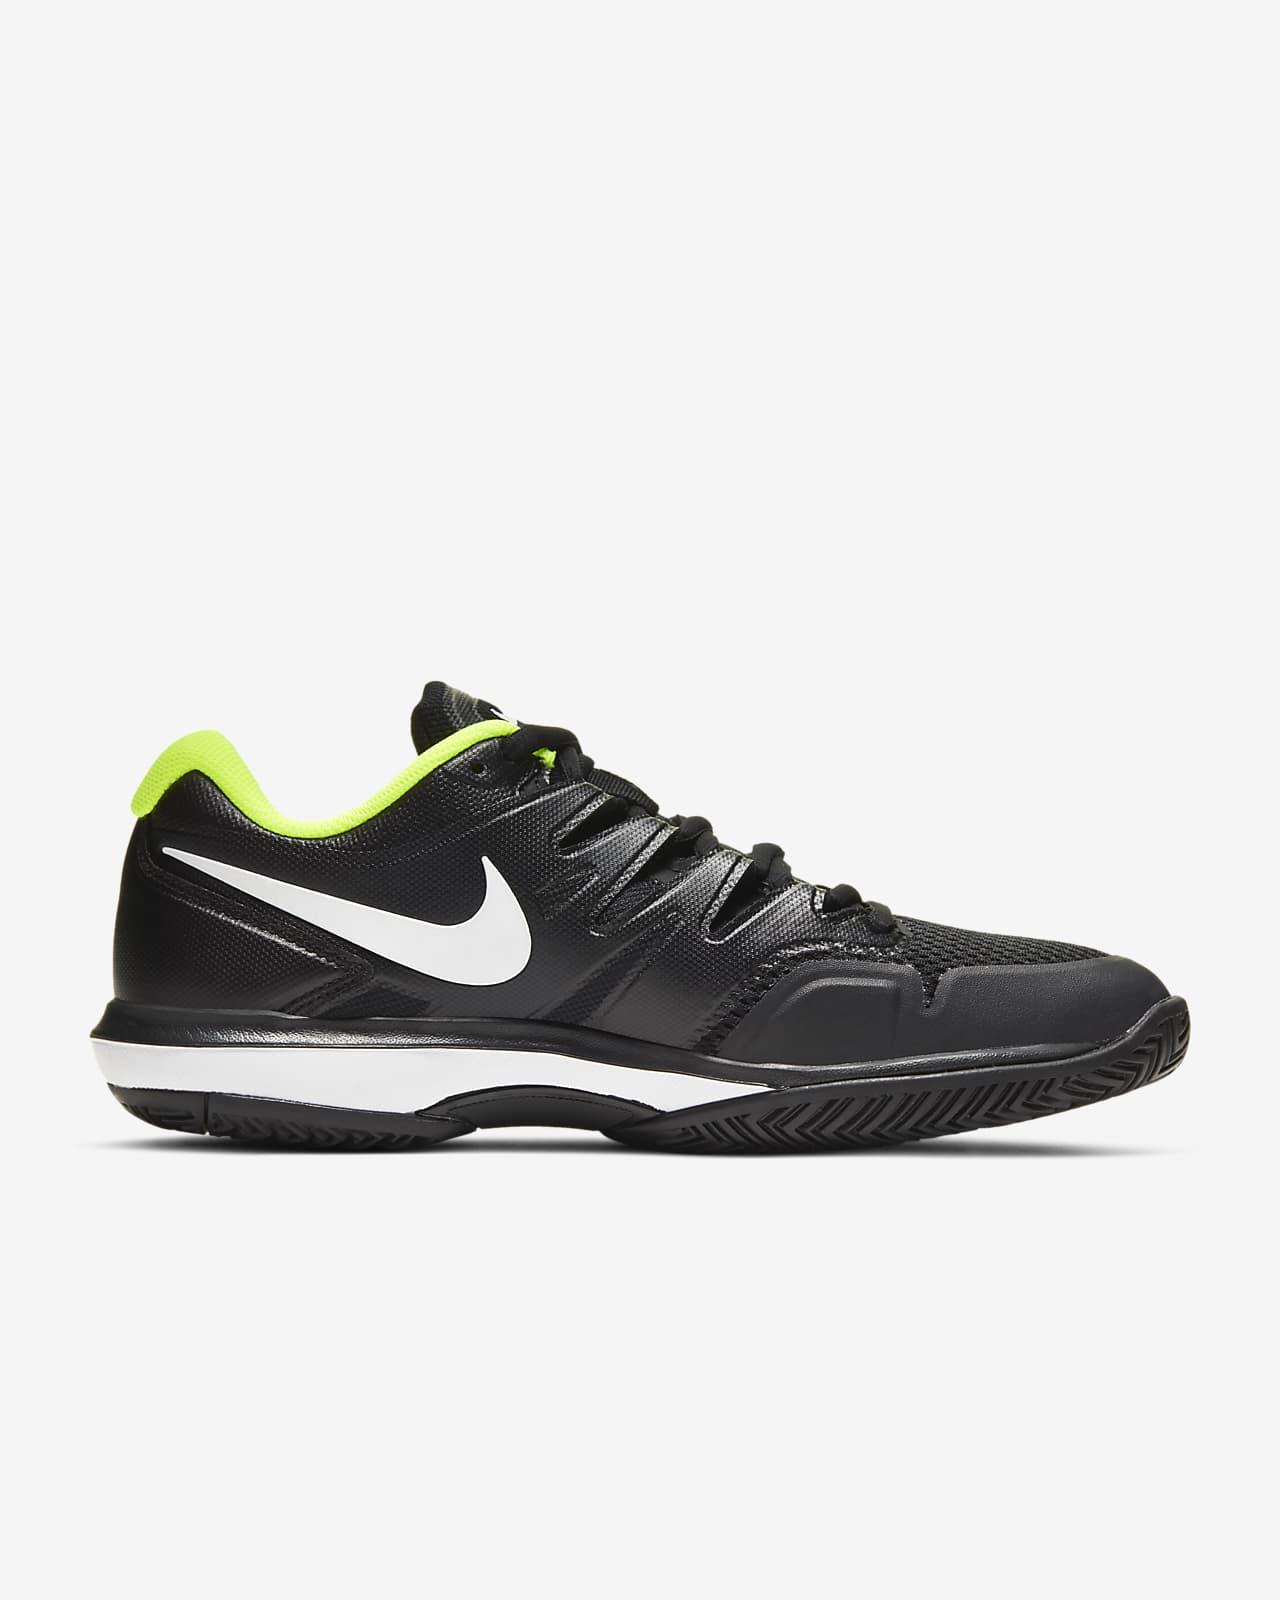 NikeCourt Air Zoom Prestige Men's